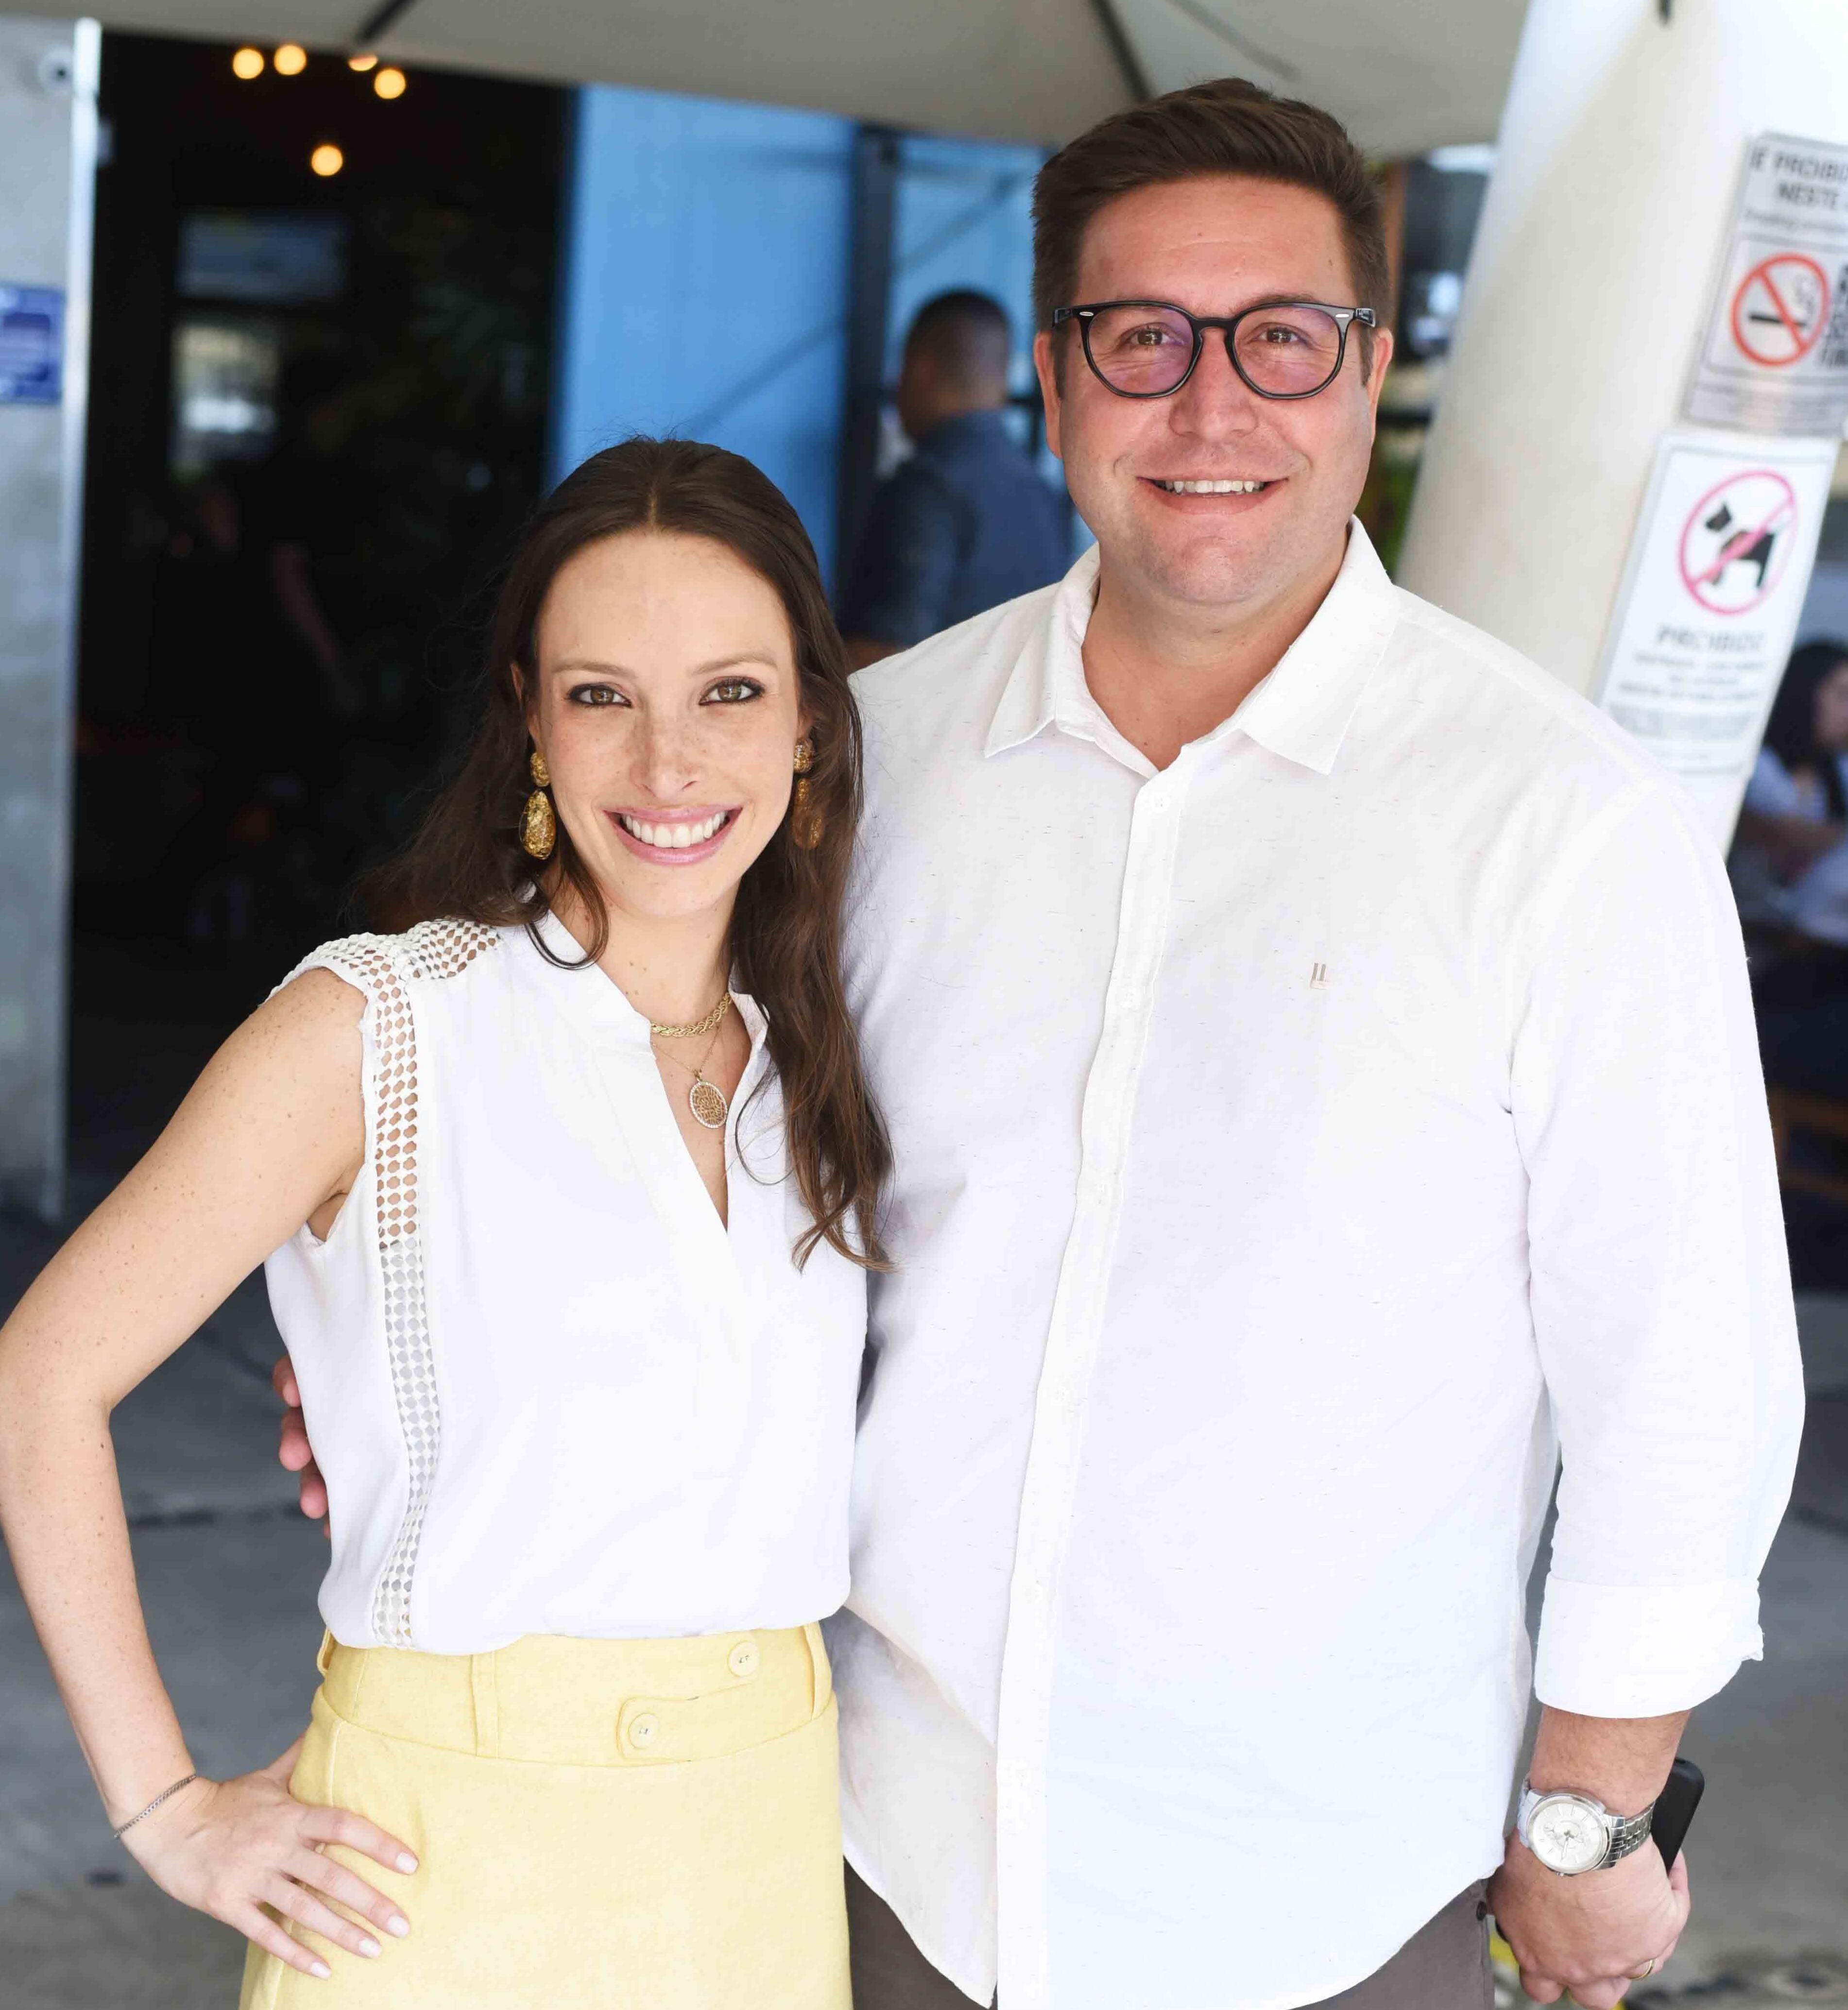 Giselle Rivkind e Alexandre Lobo /Foto: Ari Kaye